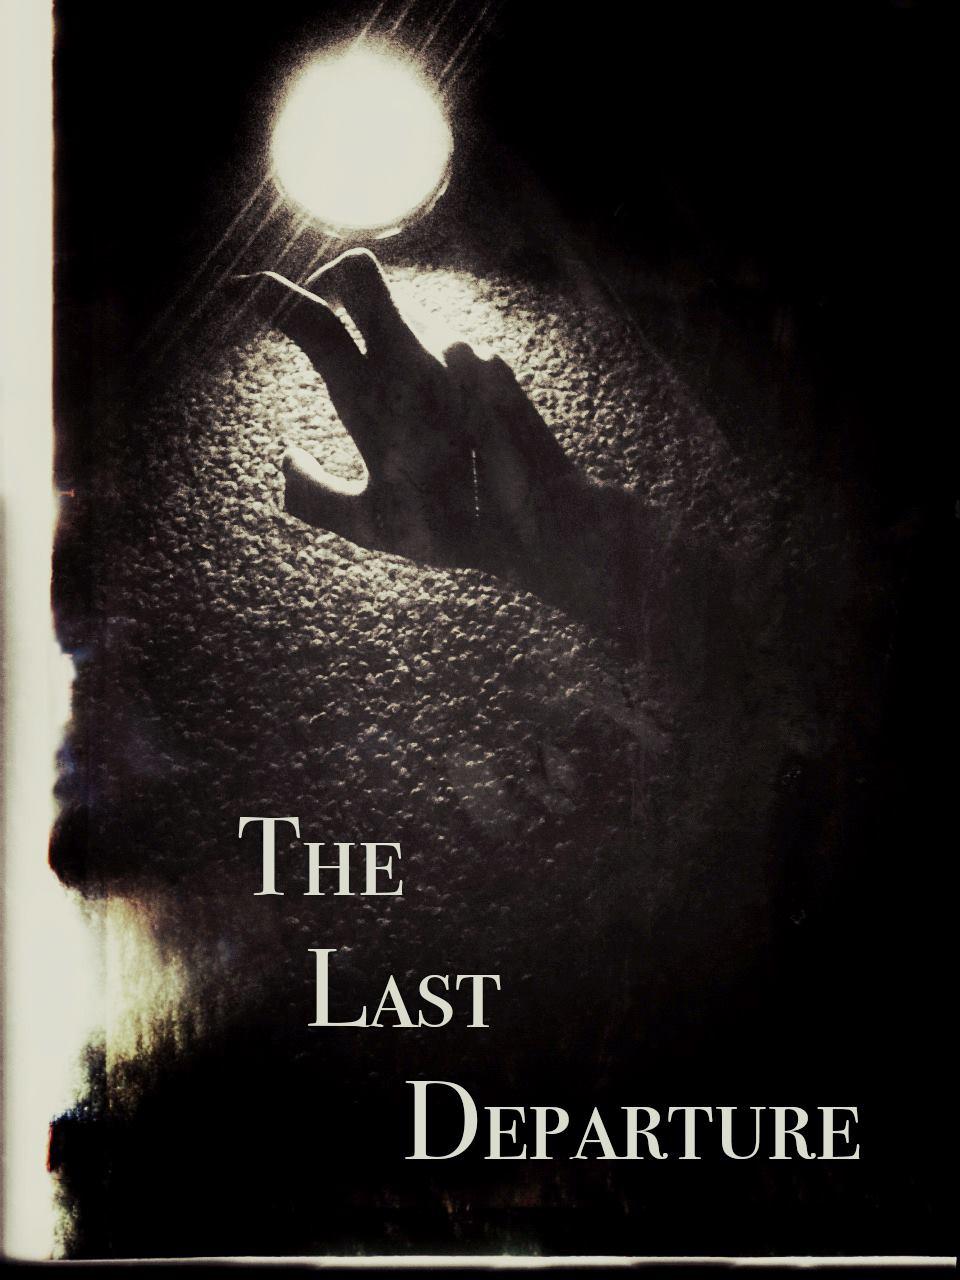 The Last Departure